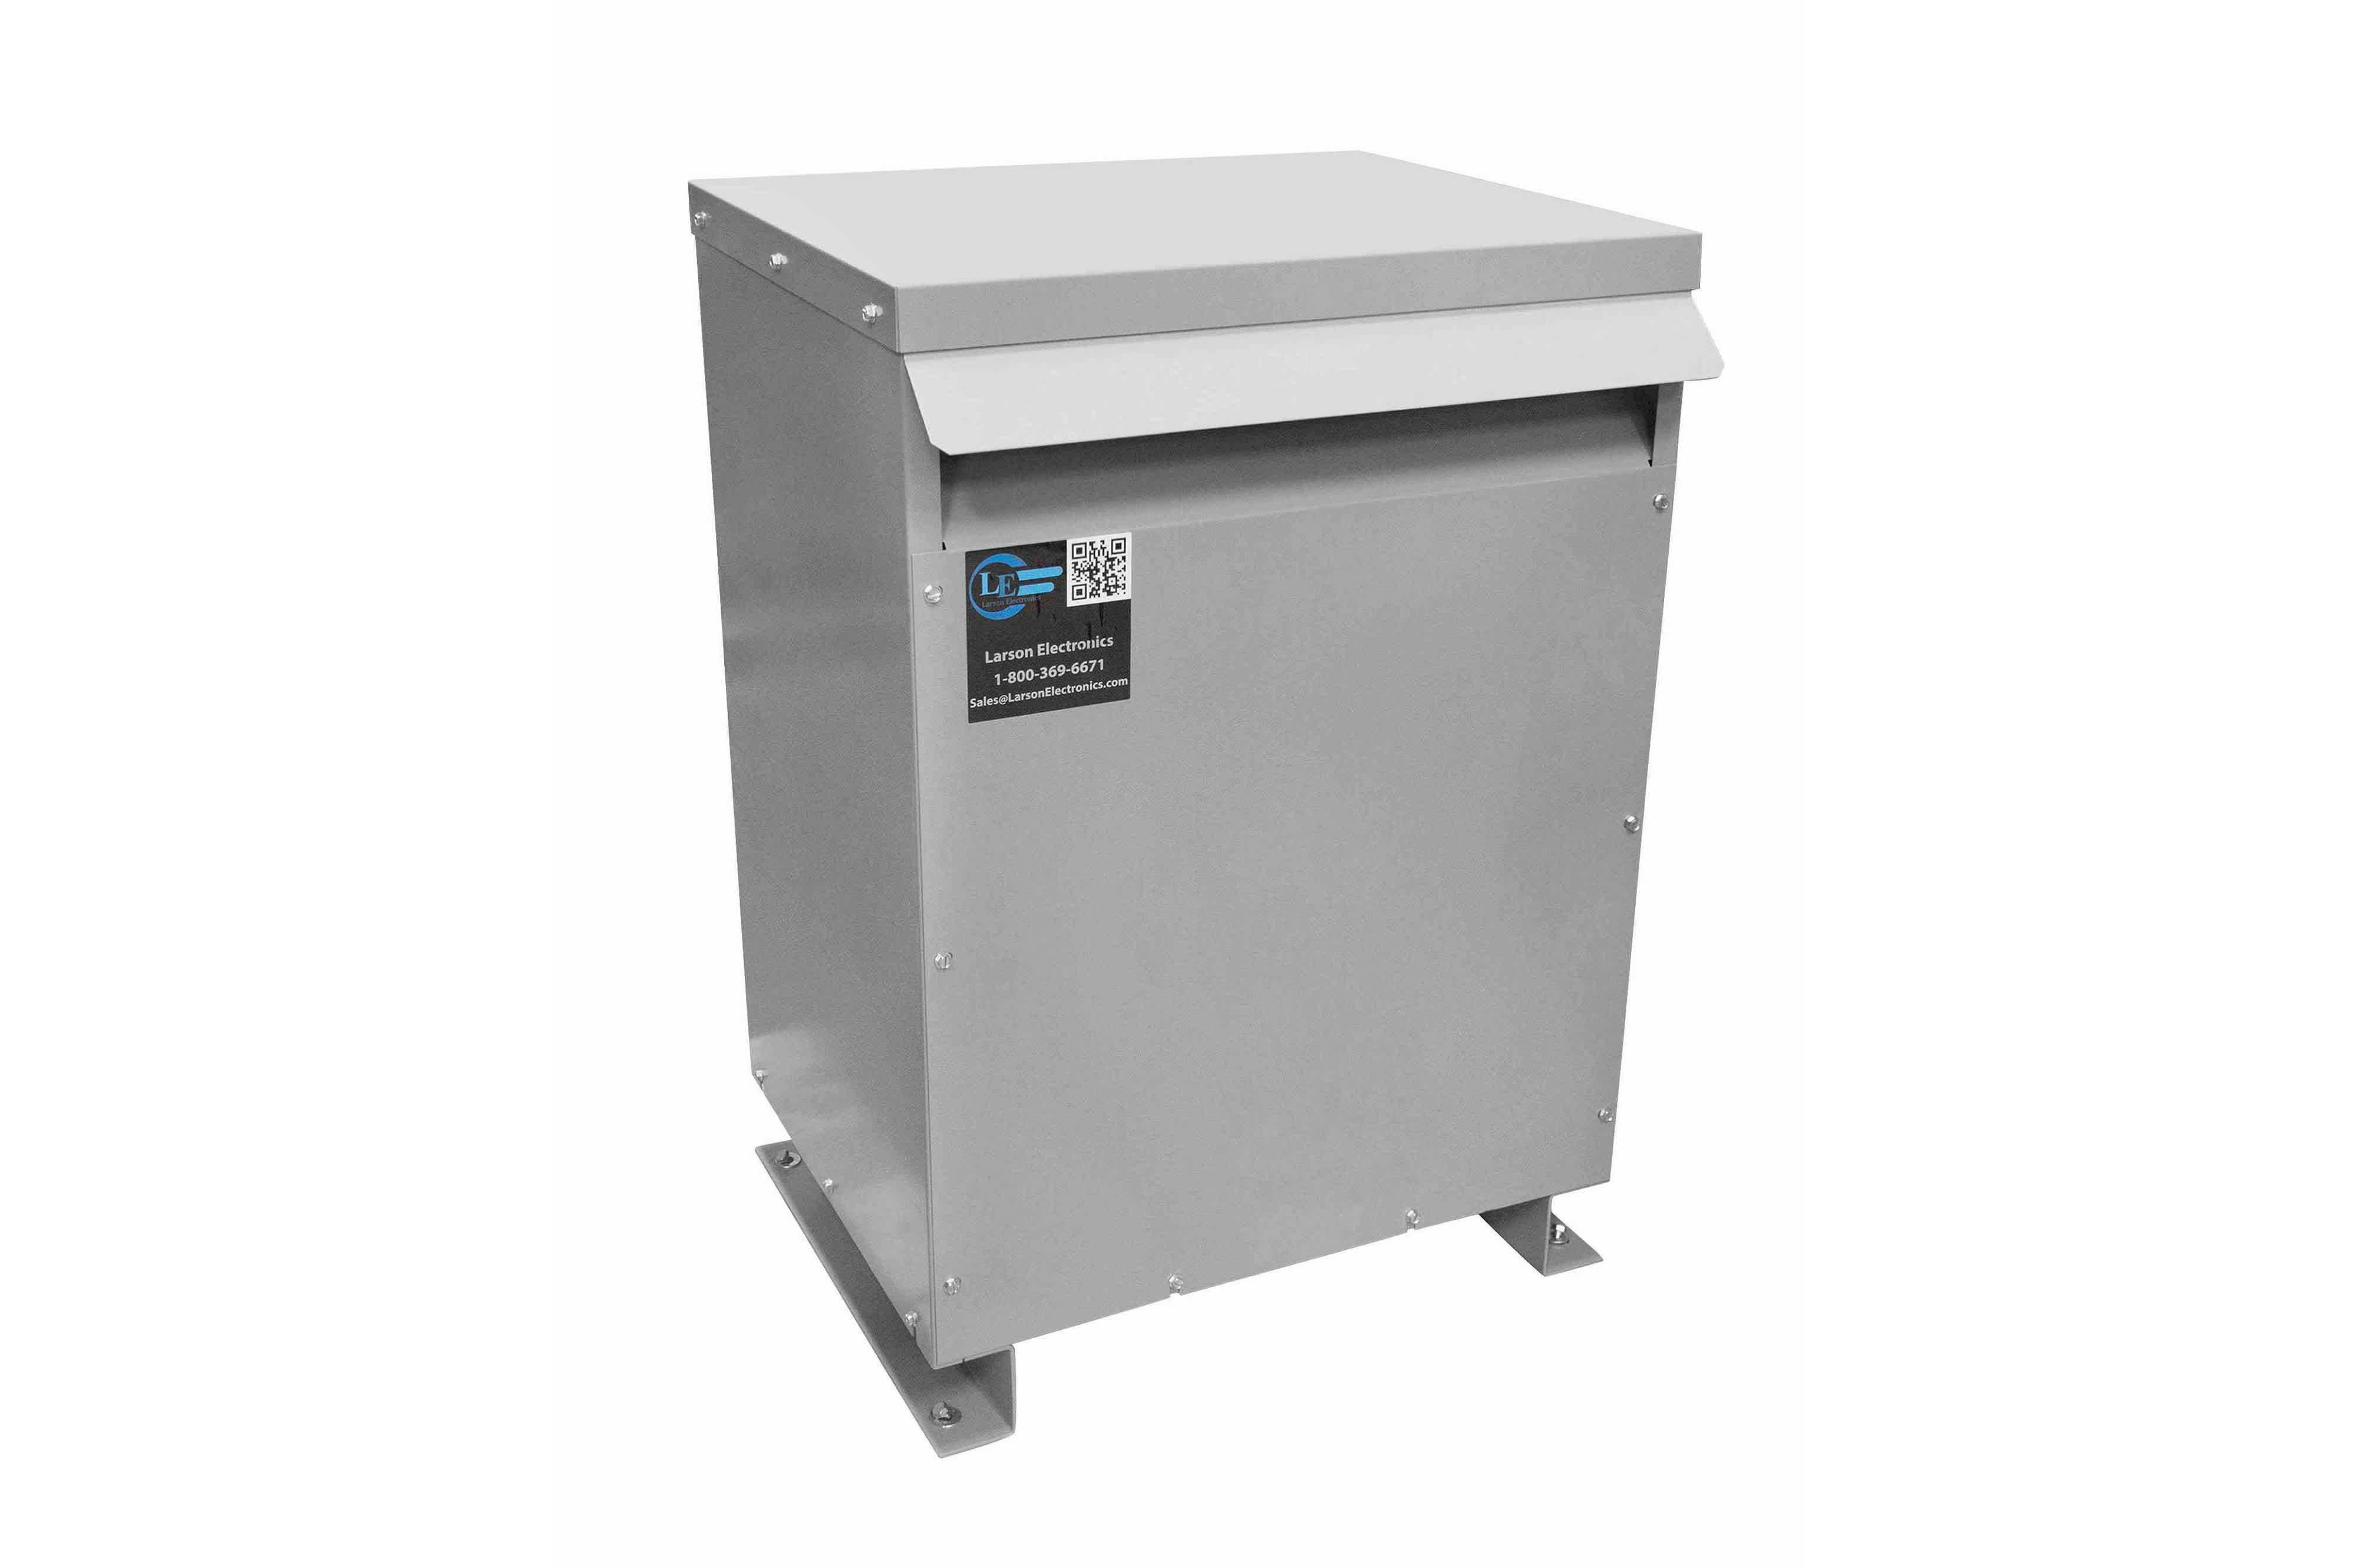 90 kVA 3PH Isolation Transformer, 460V Wye Primary, 208Y/120 Wye-N Secondary, N3R, Ventilated, 60 Hz